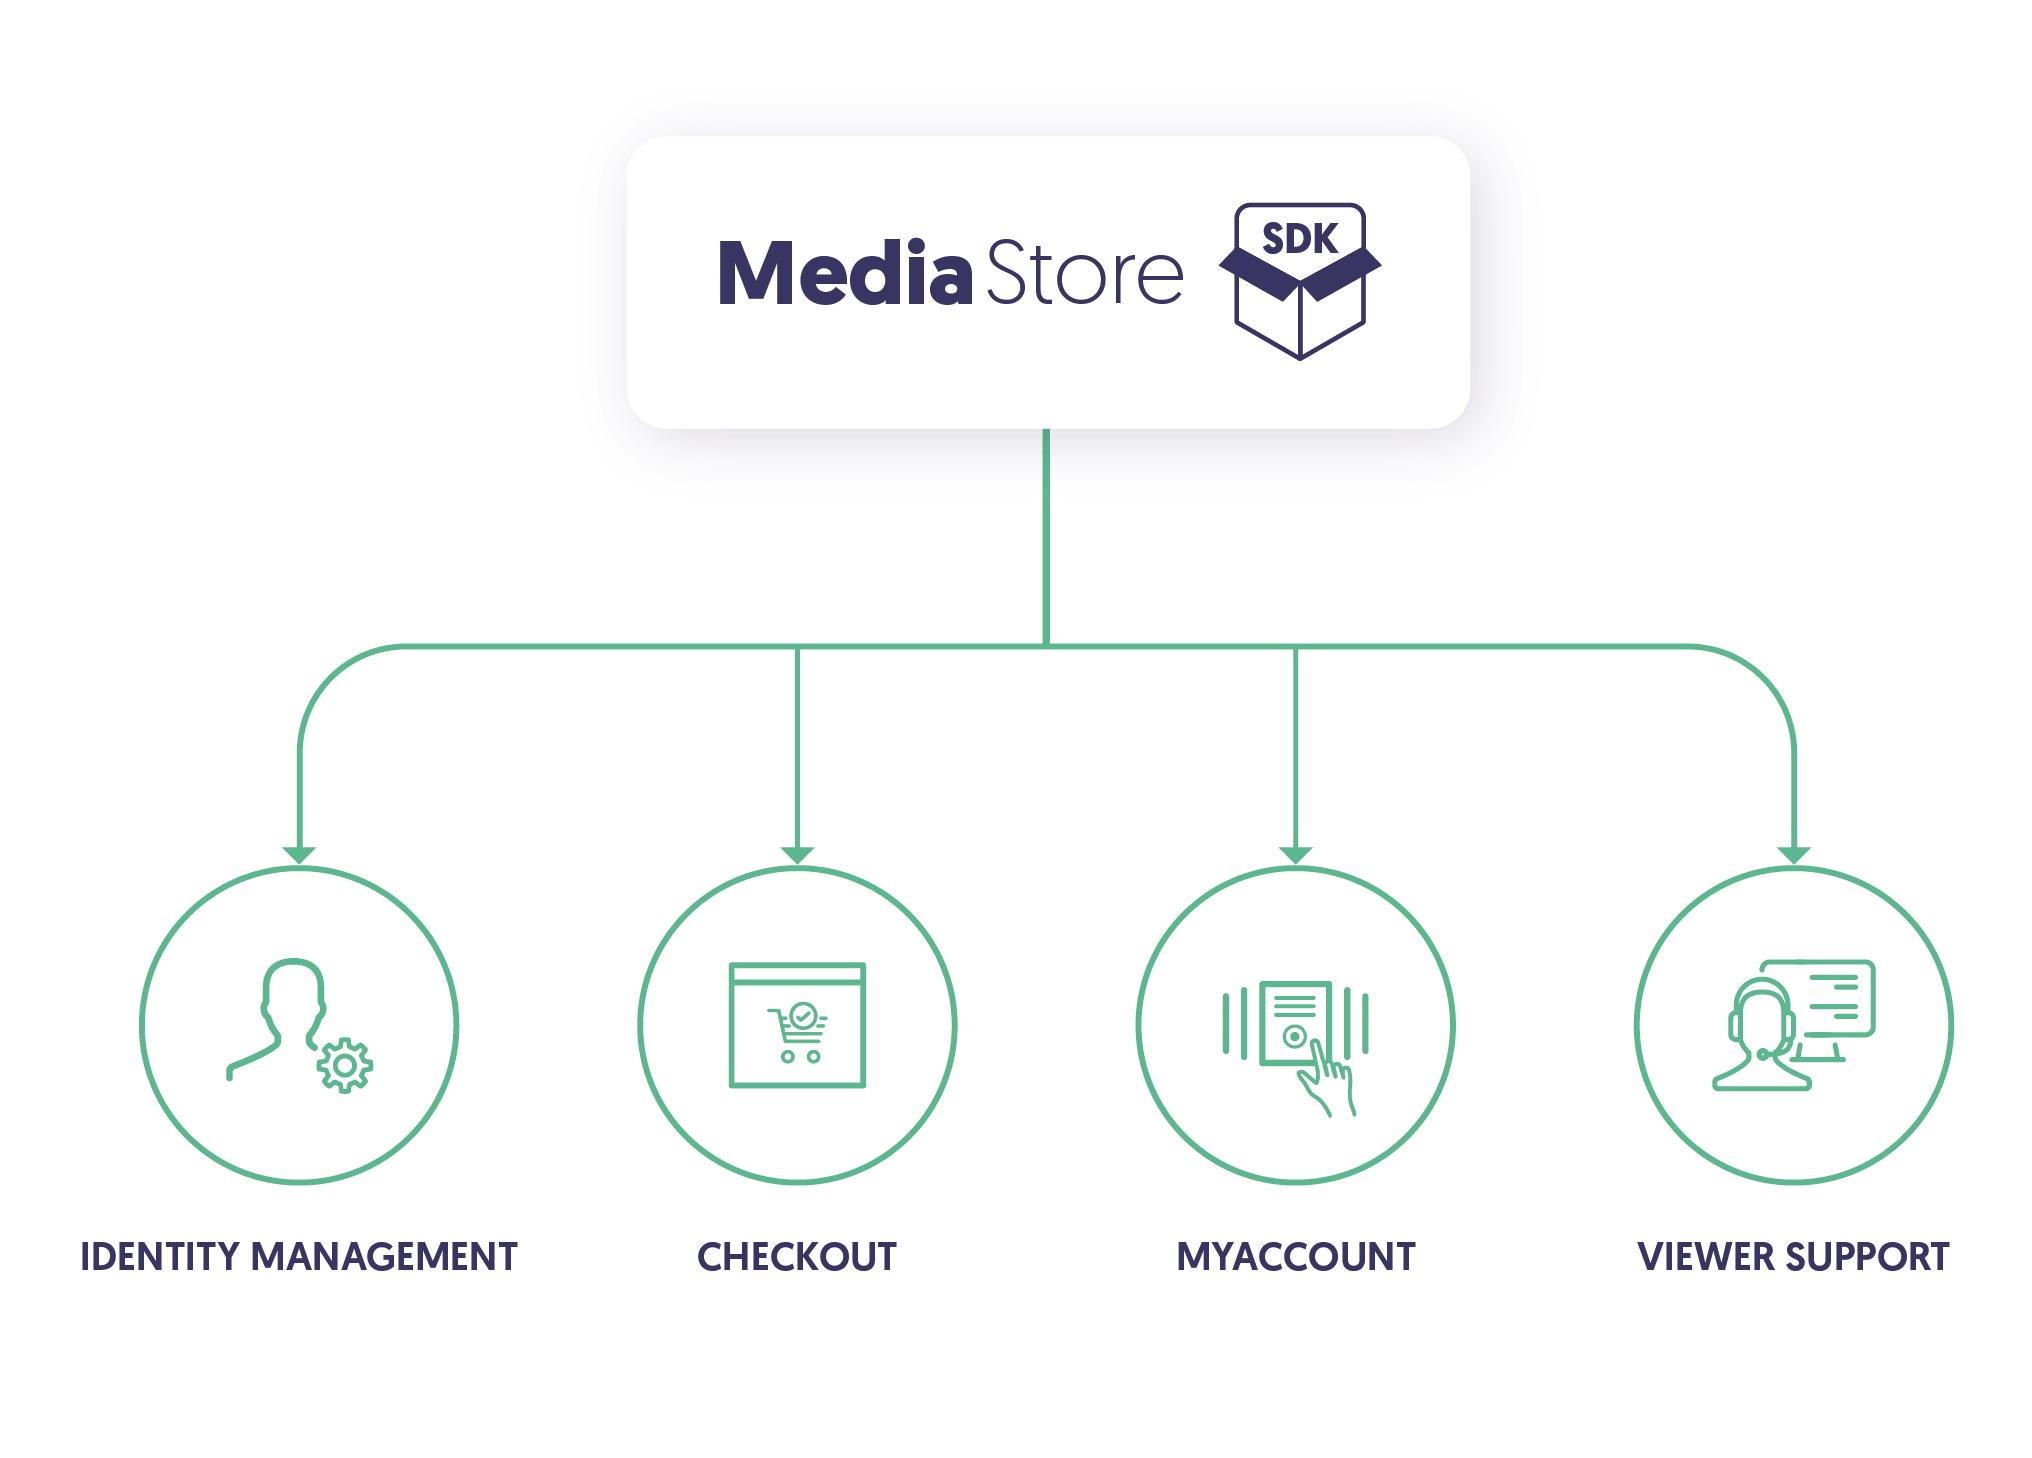 MEDIASTORE segments